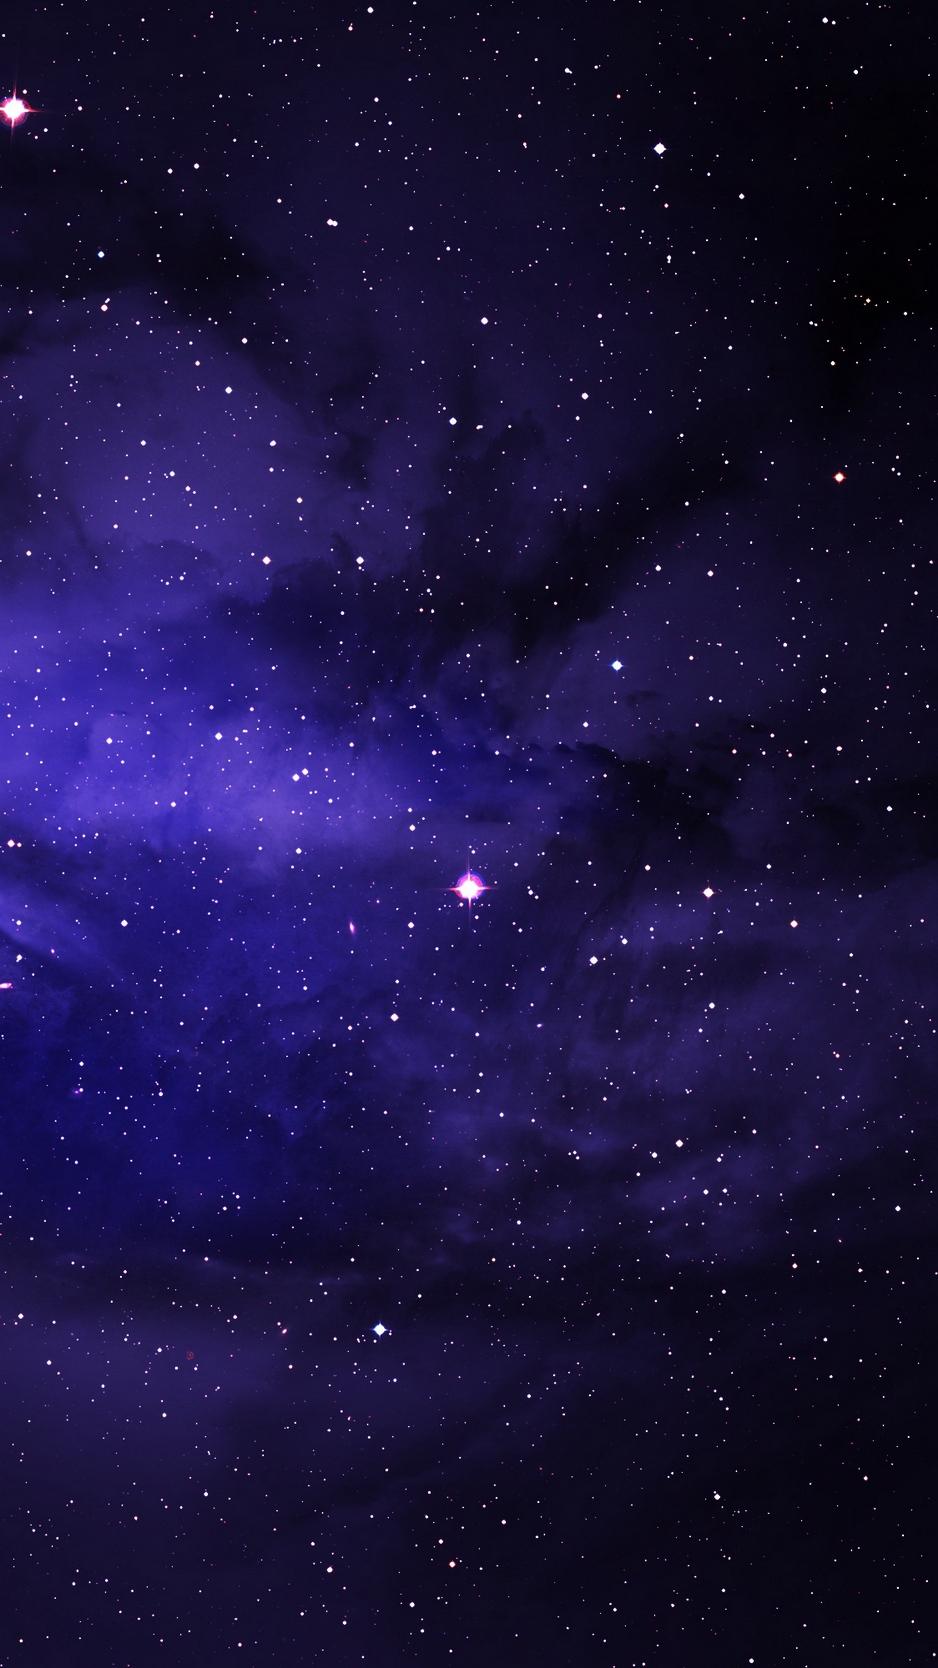 Free Download Download Wallpaper 938x1668 Stars Space Galaxy